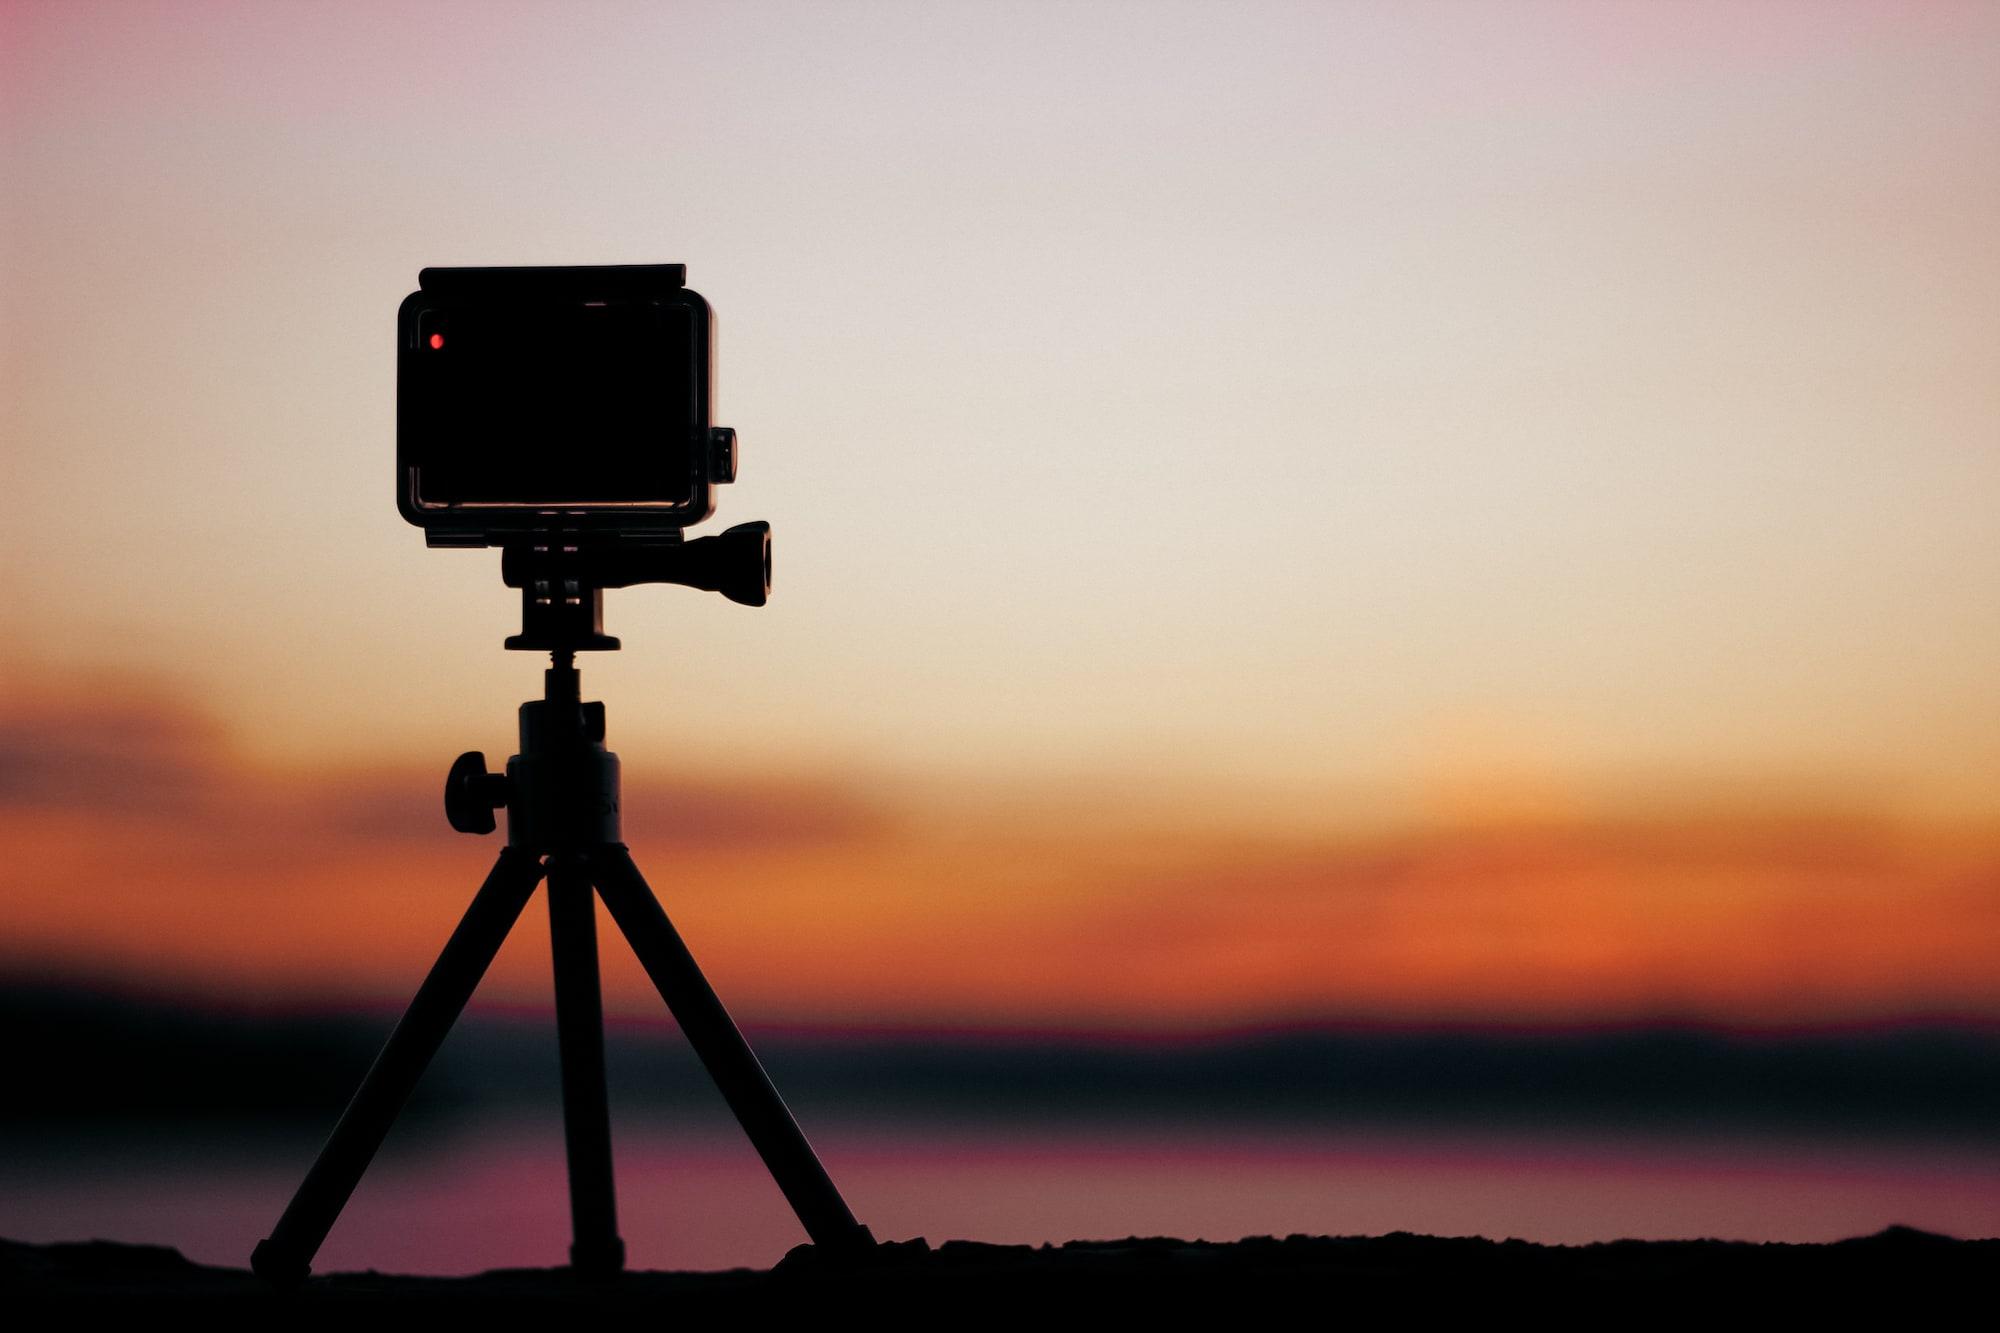 reiseblogger kamera equipment go pro 8 hero